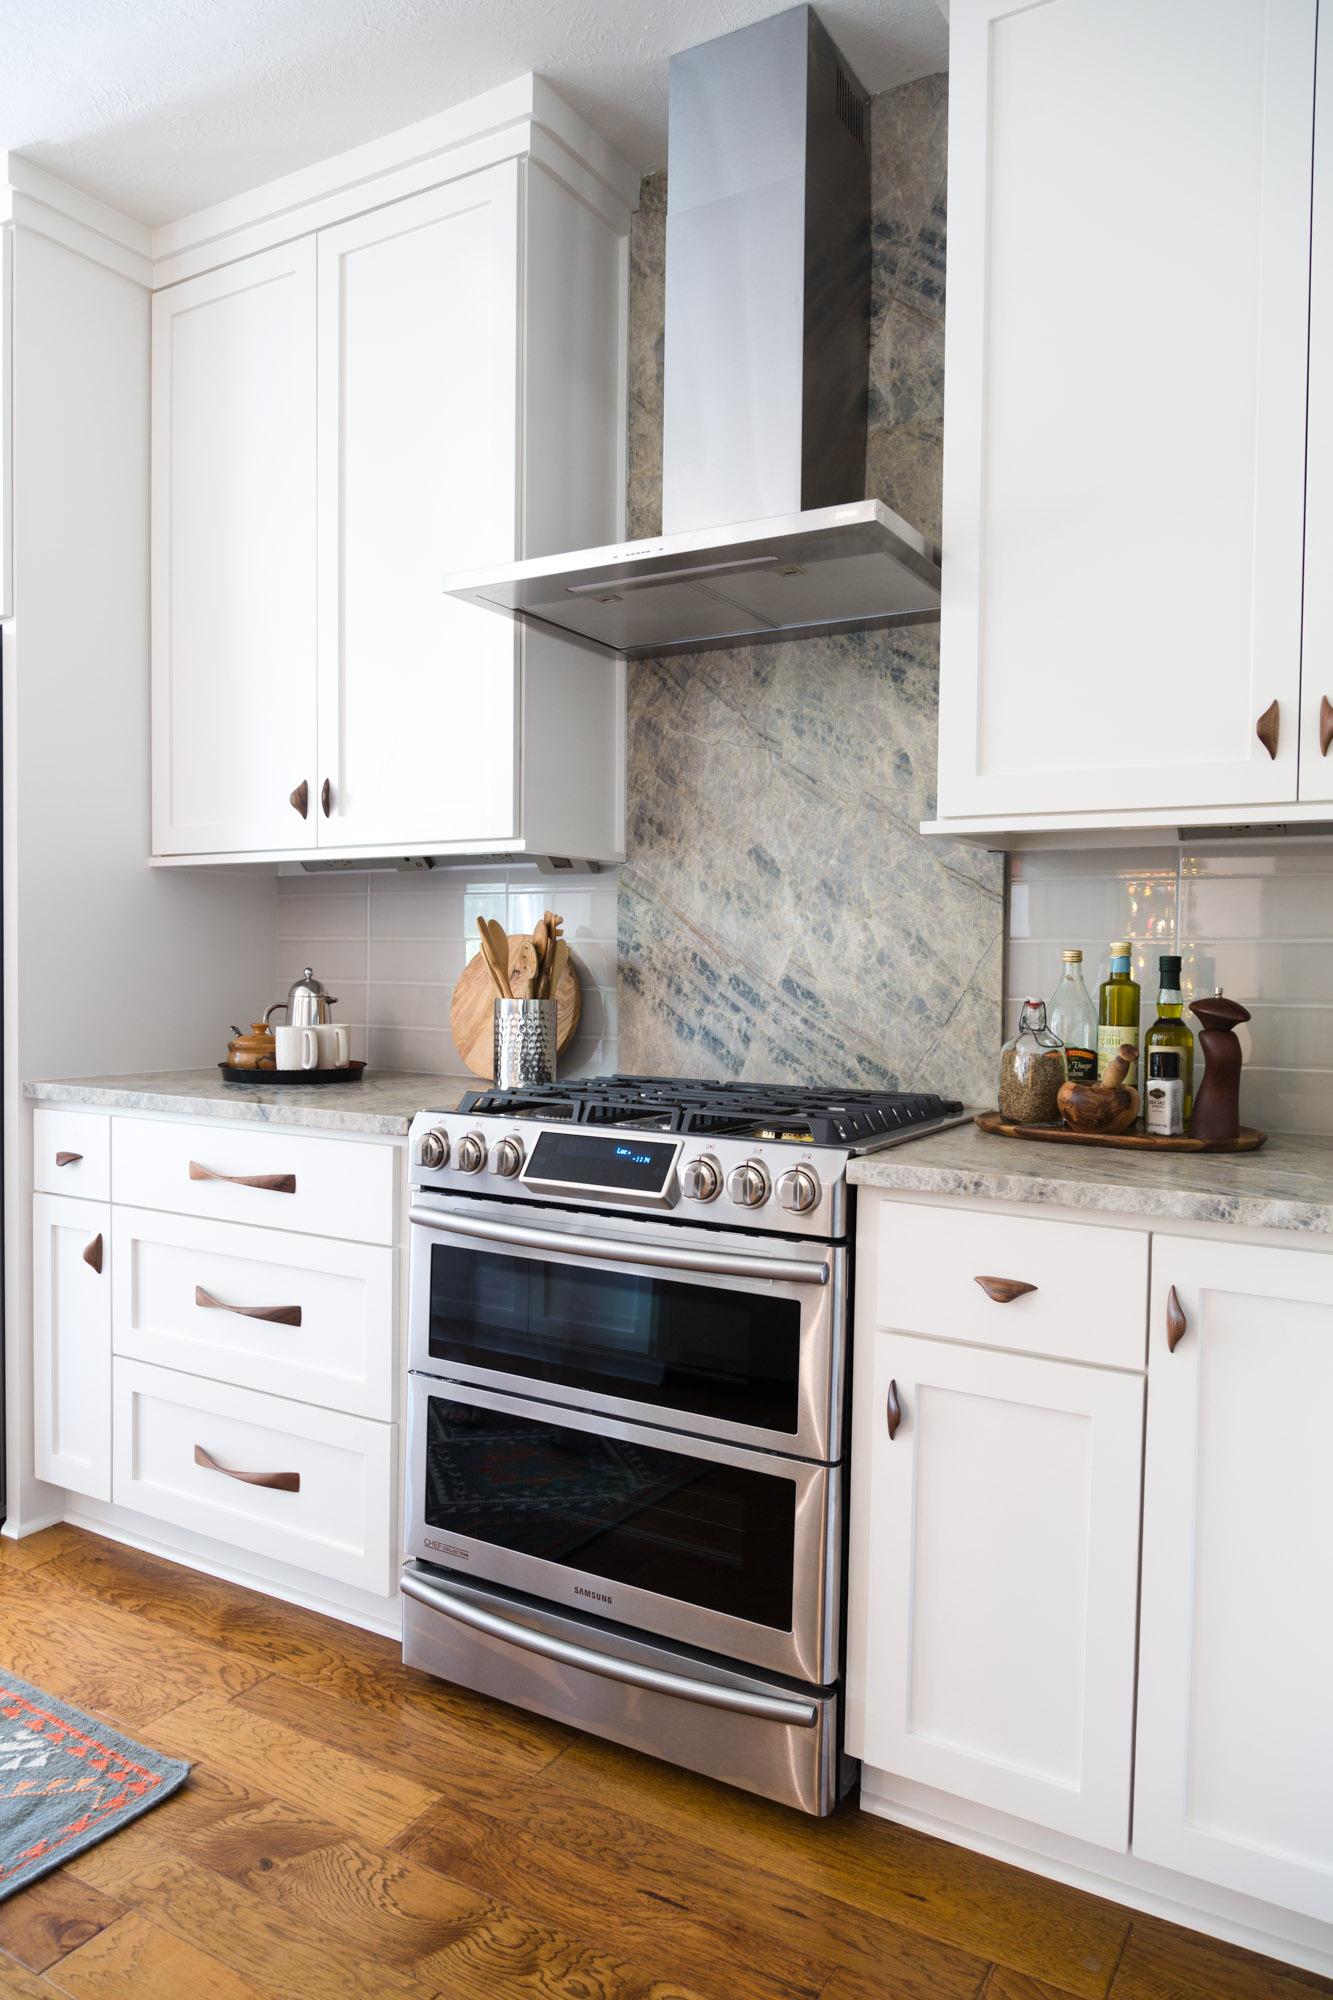 Kitchen remodel with white cabinets, quartzite countertop and splash, wood cabinet pulls, Designer: Carla Aston